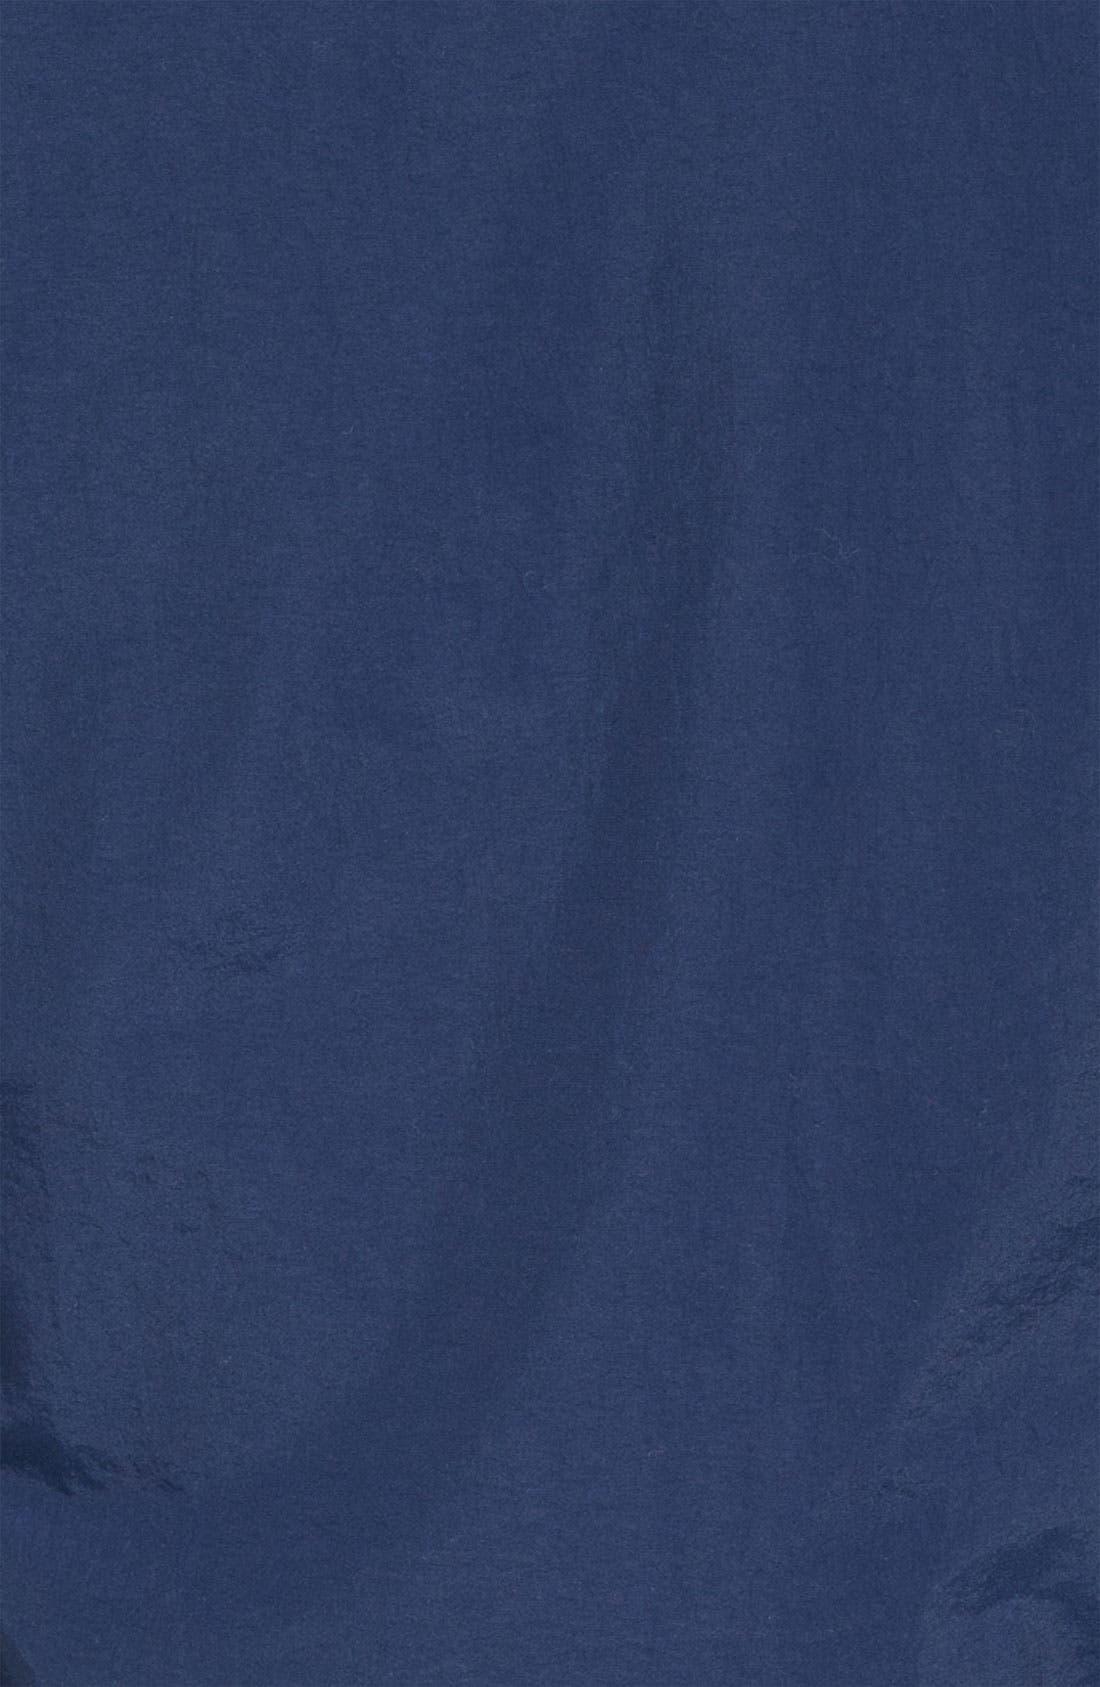 RAG & BONE,                             'Yorke' Jacket,                             Alternate thumbnail 2, color,                             402